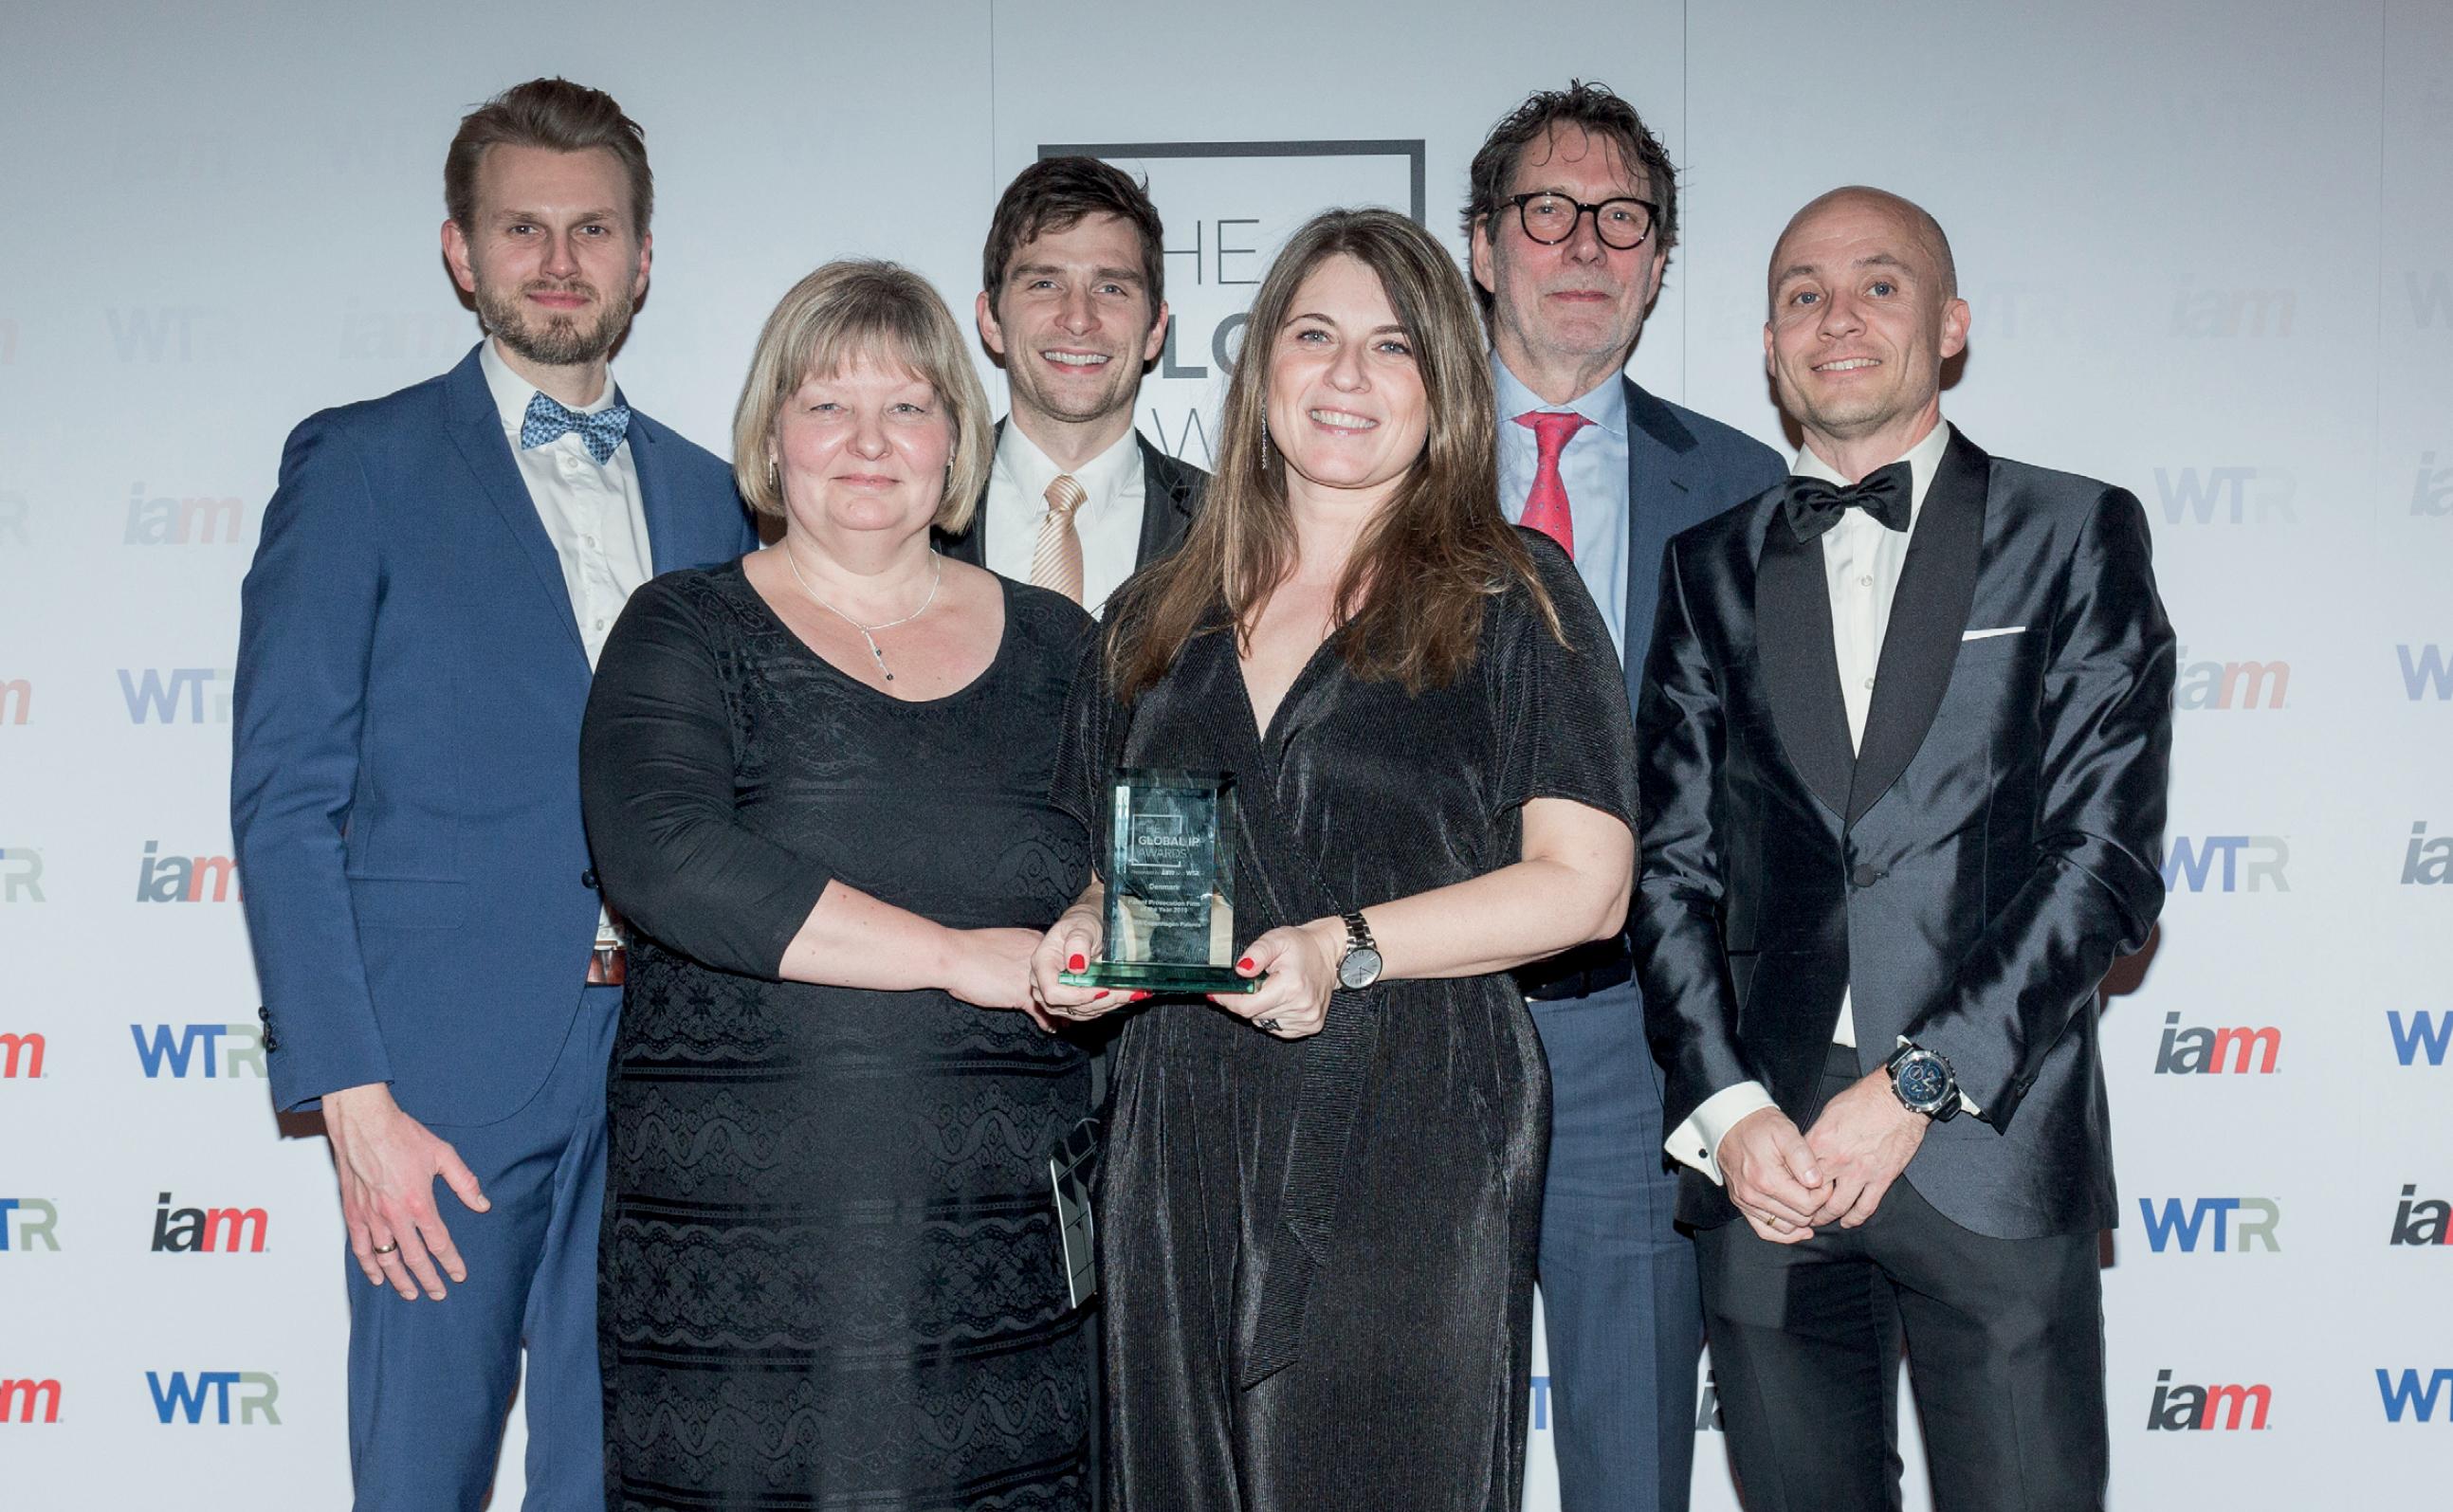 The COPA Copenhagen Patents team